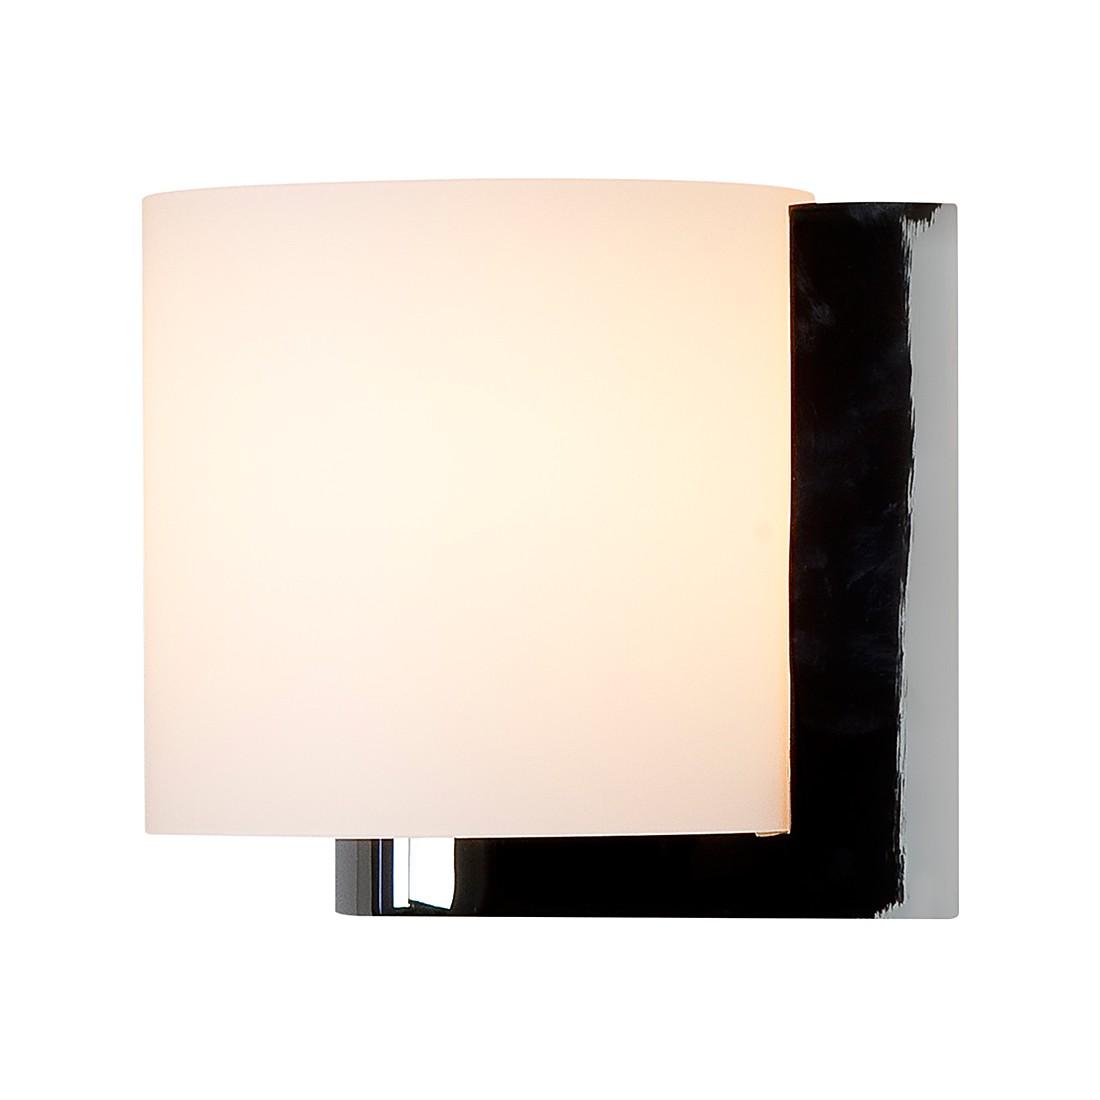 Badleuchte Siena Round ● Chrom ● 1-flammig- Illumina A++